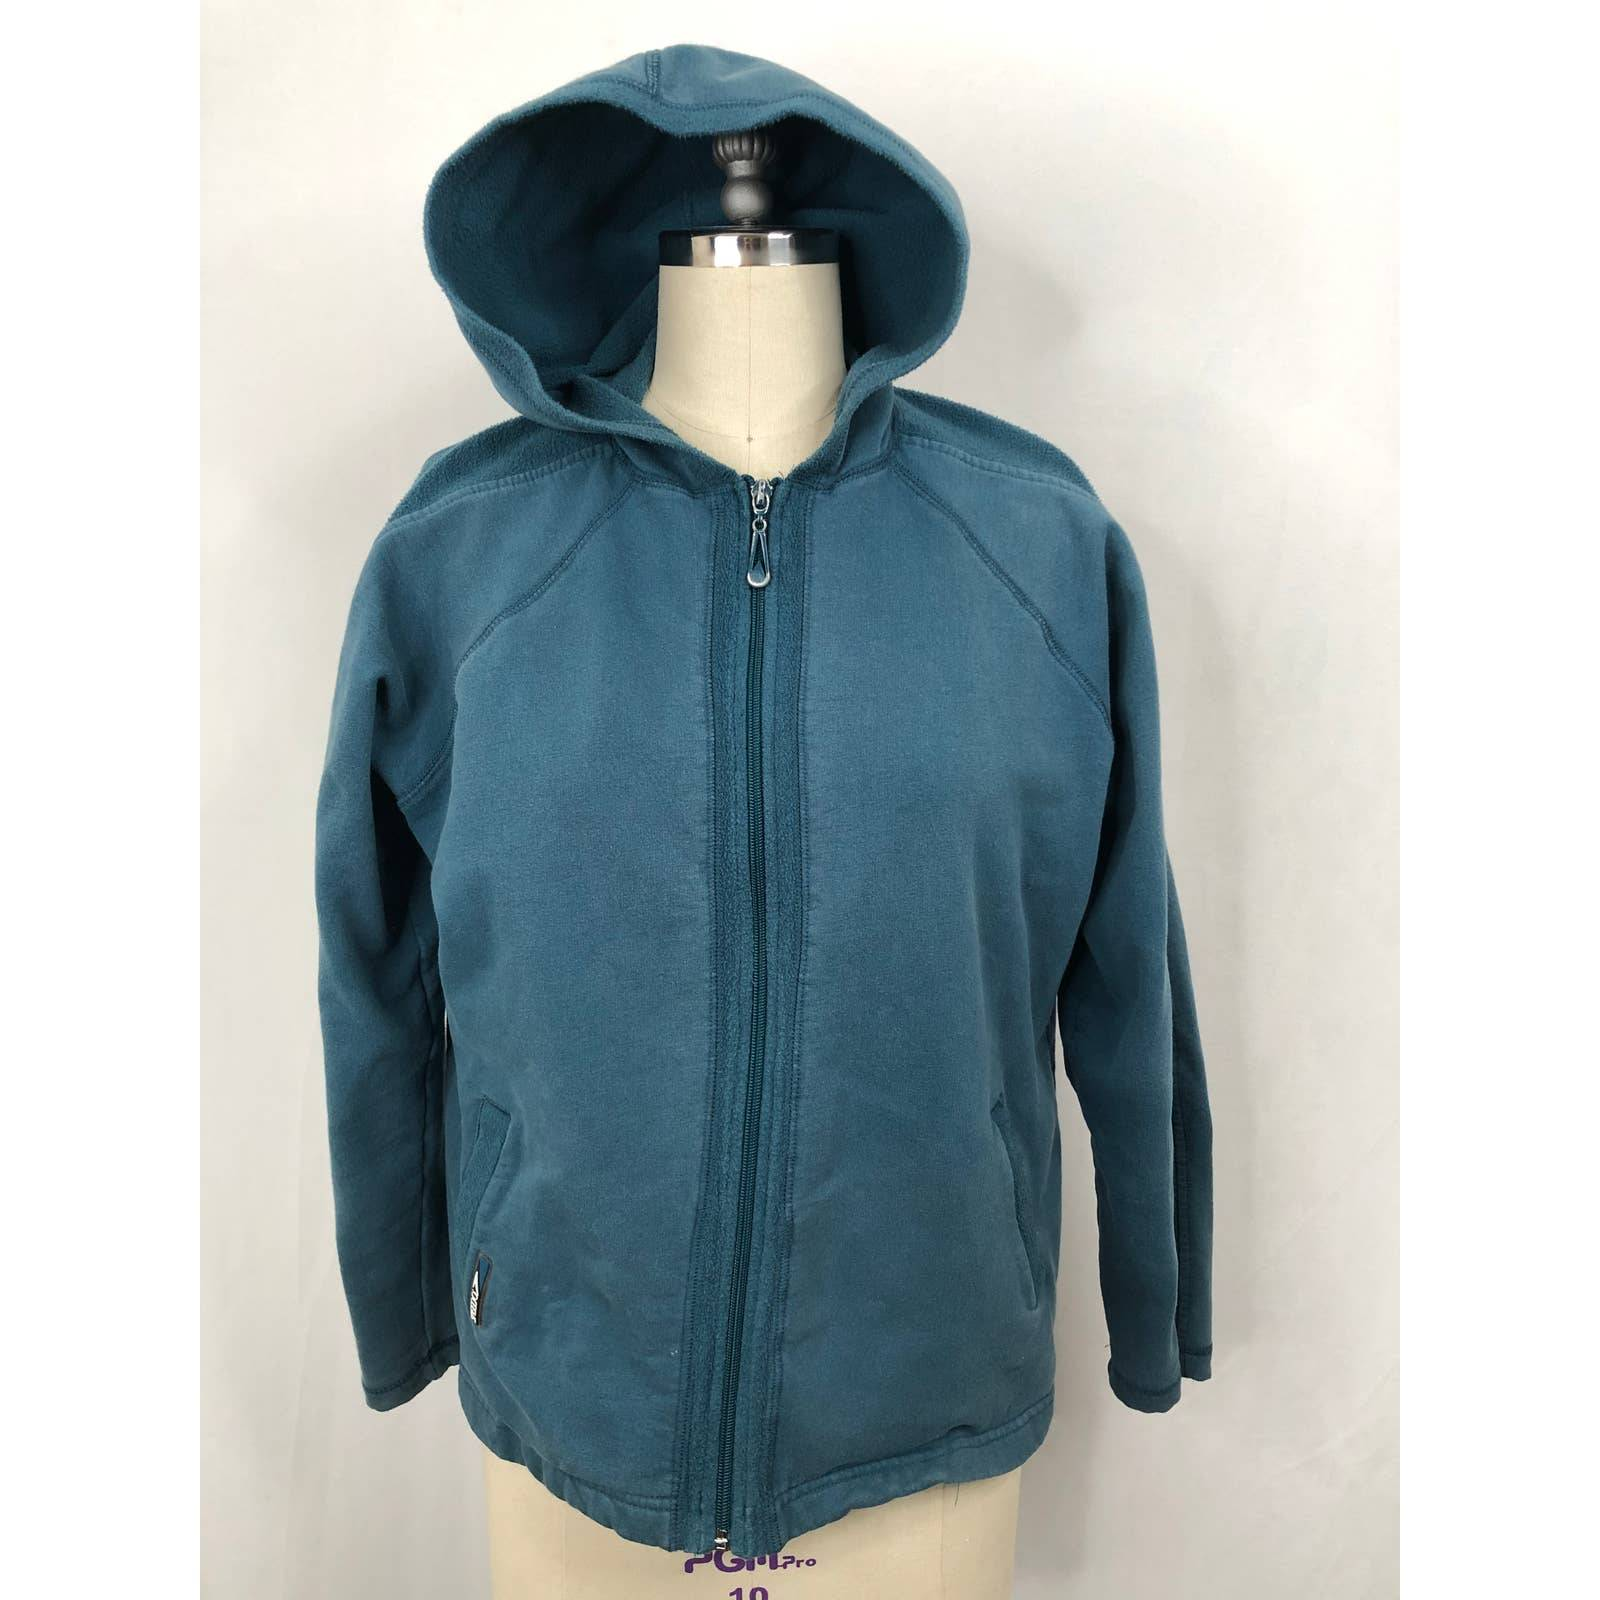 Speedo Soft Shell Activewear Jacket Blue